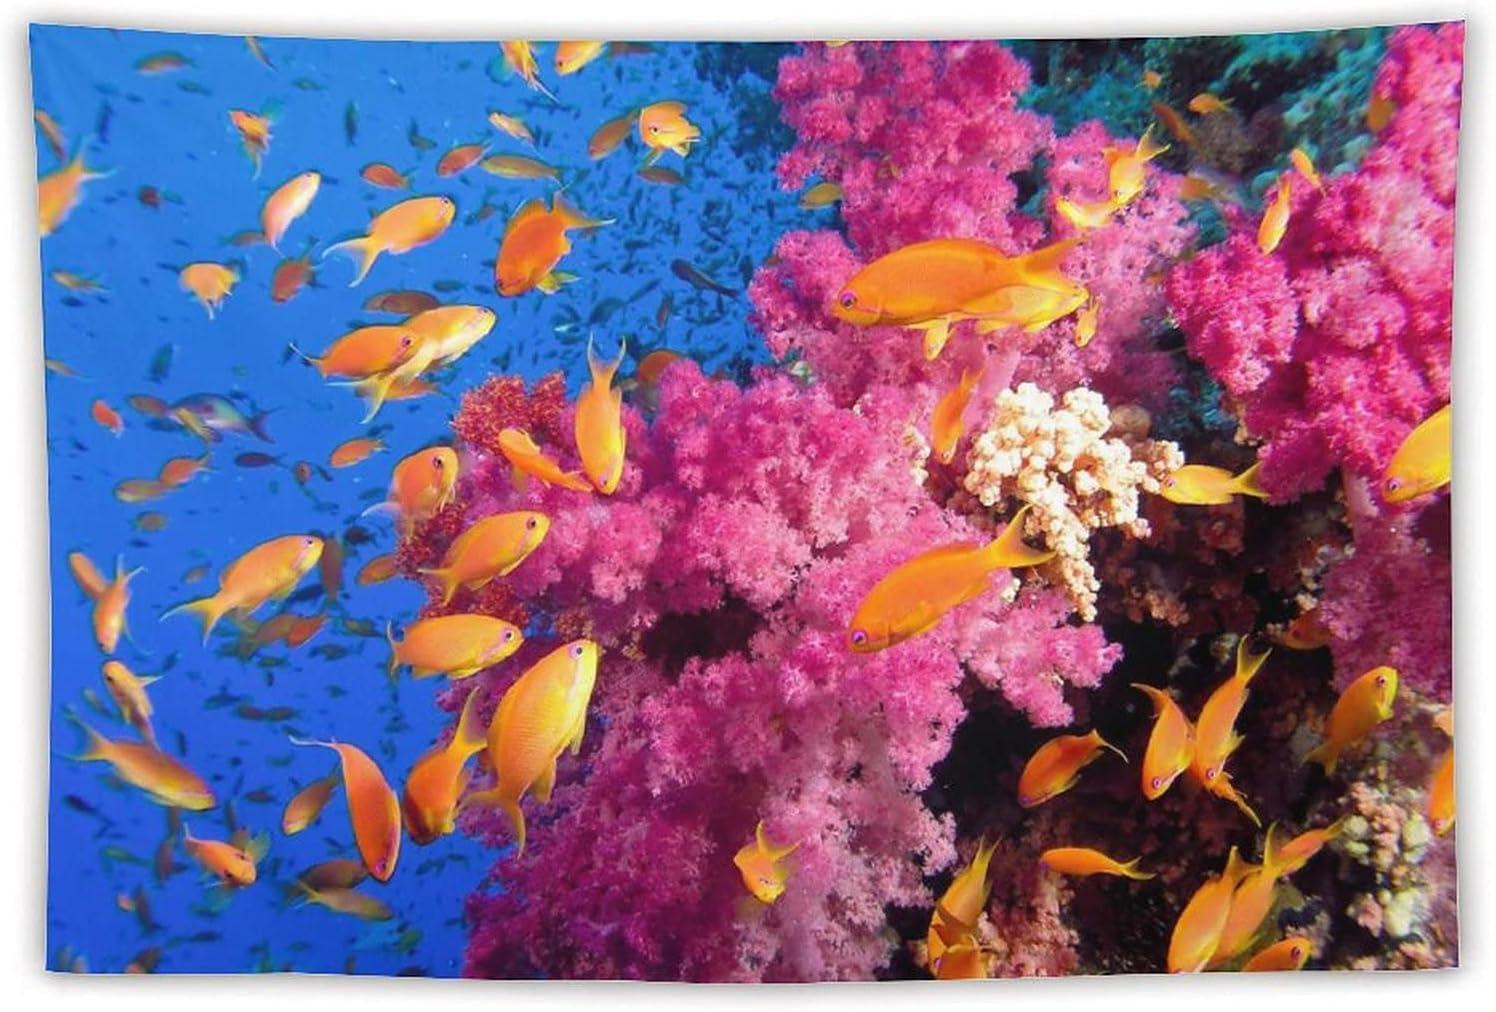 Ocean Underwater Golden Shoal of High material Coral Popularity Tropical Purple Fish